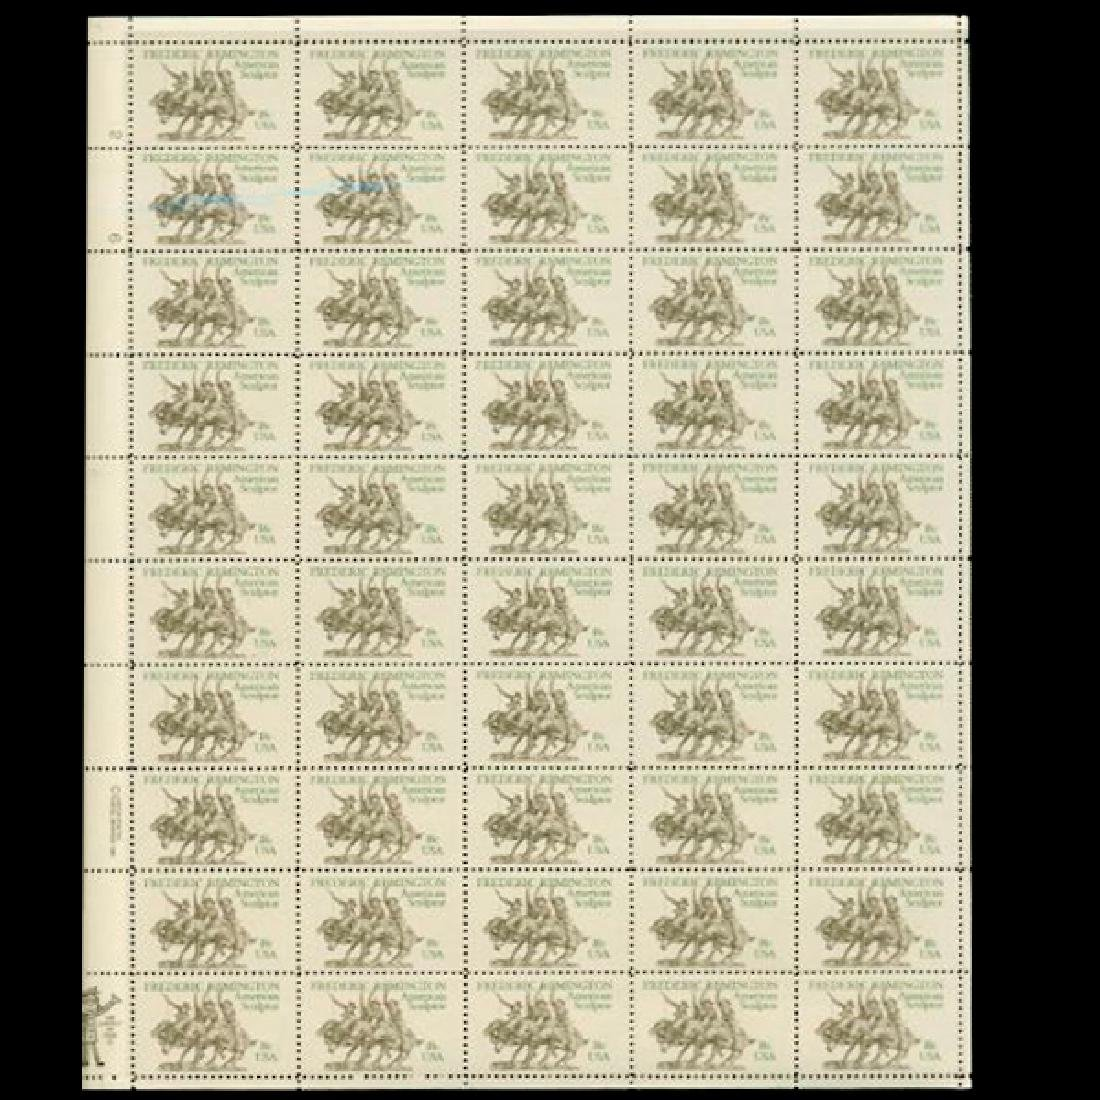 1981 US Sheet 18c Frederick Remington Stamps MNH Error